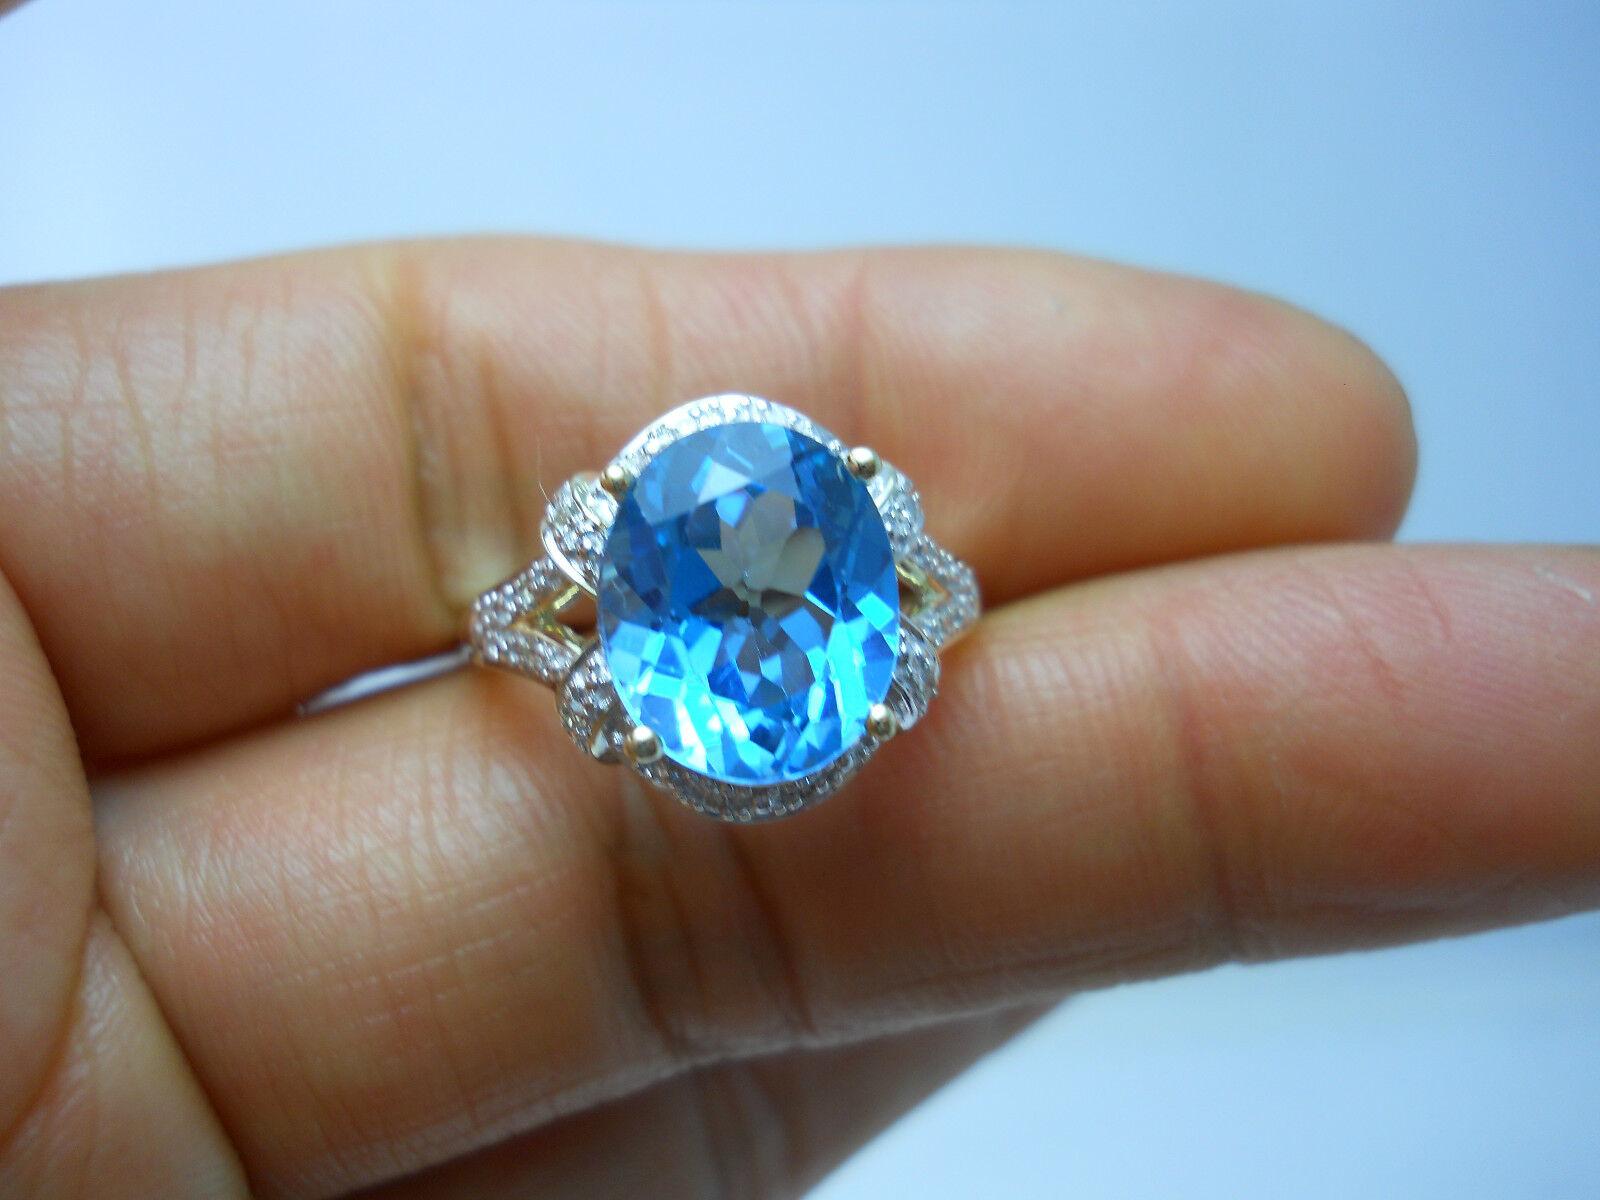 STUNNING 10K YG LADIES TOPAZ & DIAMOND RING SIZE 7.25  G75299-1